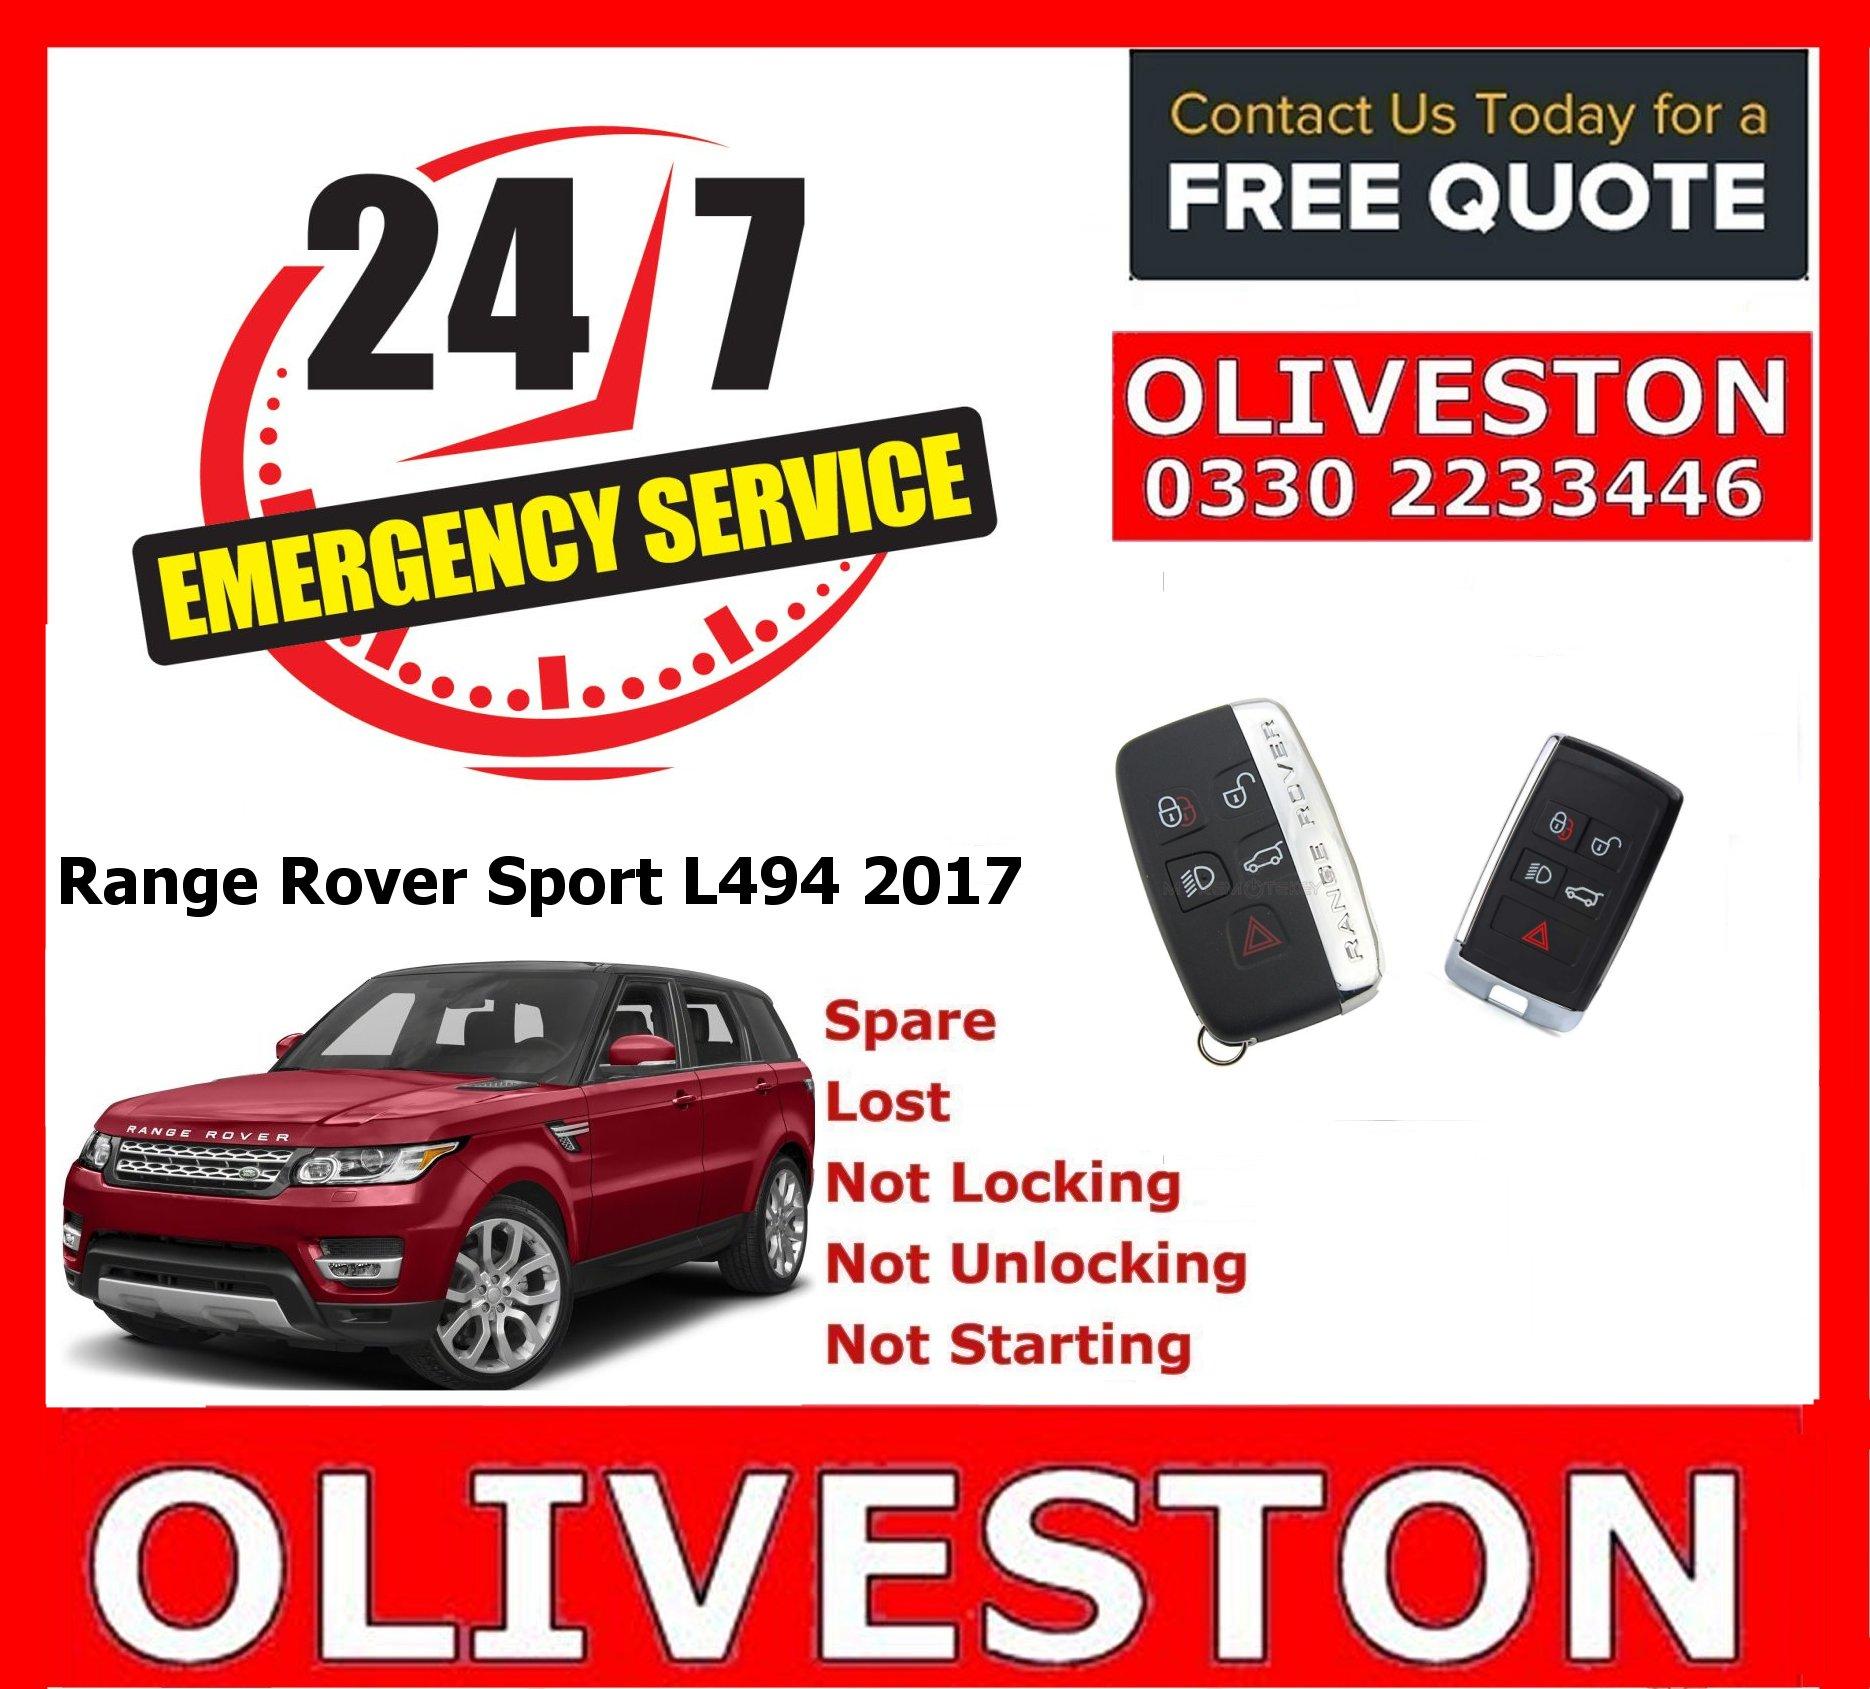 Range Rover Land Rover Jaguar Spare lost keys Belfast County Antrim Newtownabbey Lisburn County Antrim Ballymena